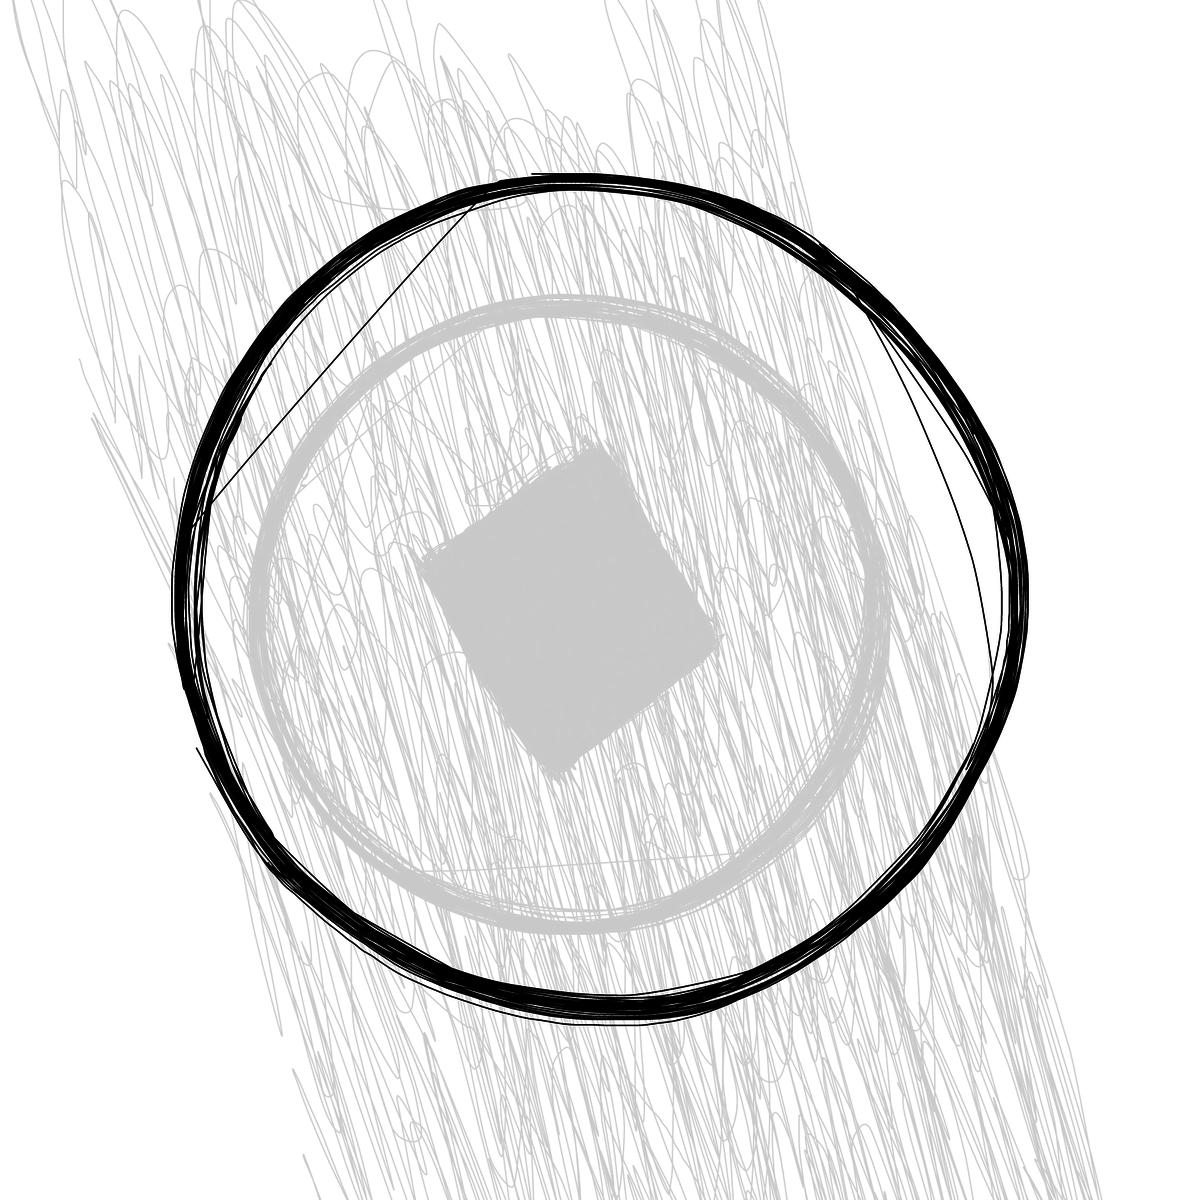 BAAAM drawing#8940 lat:52.4885101318359400lng: 13.4249372482299800